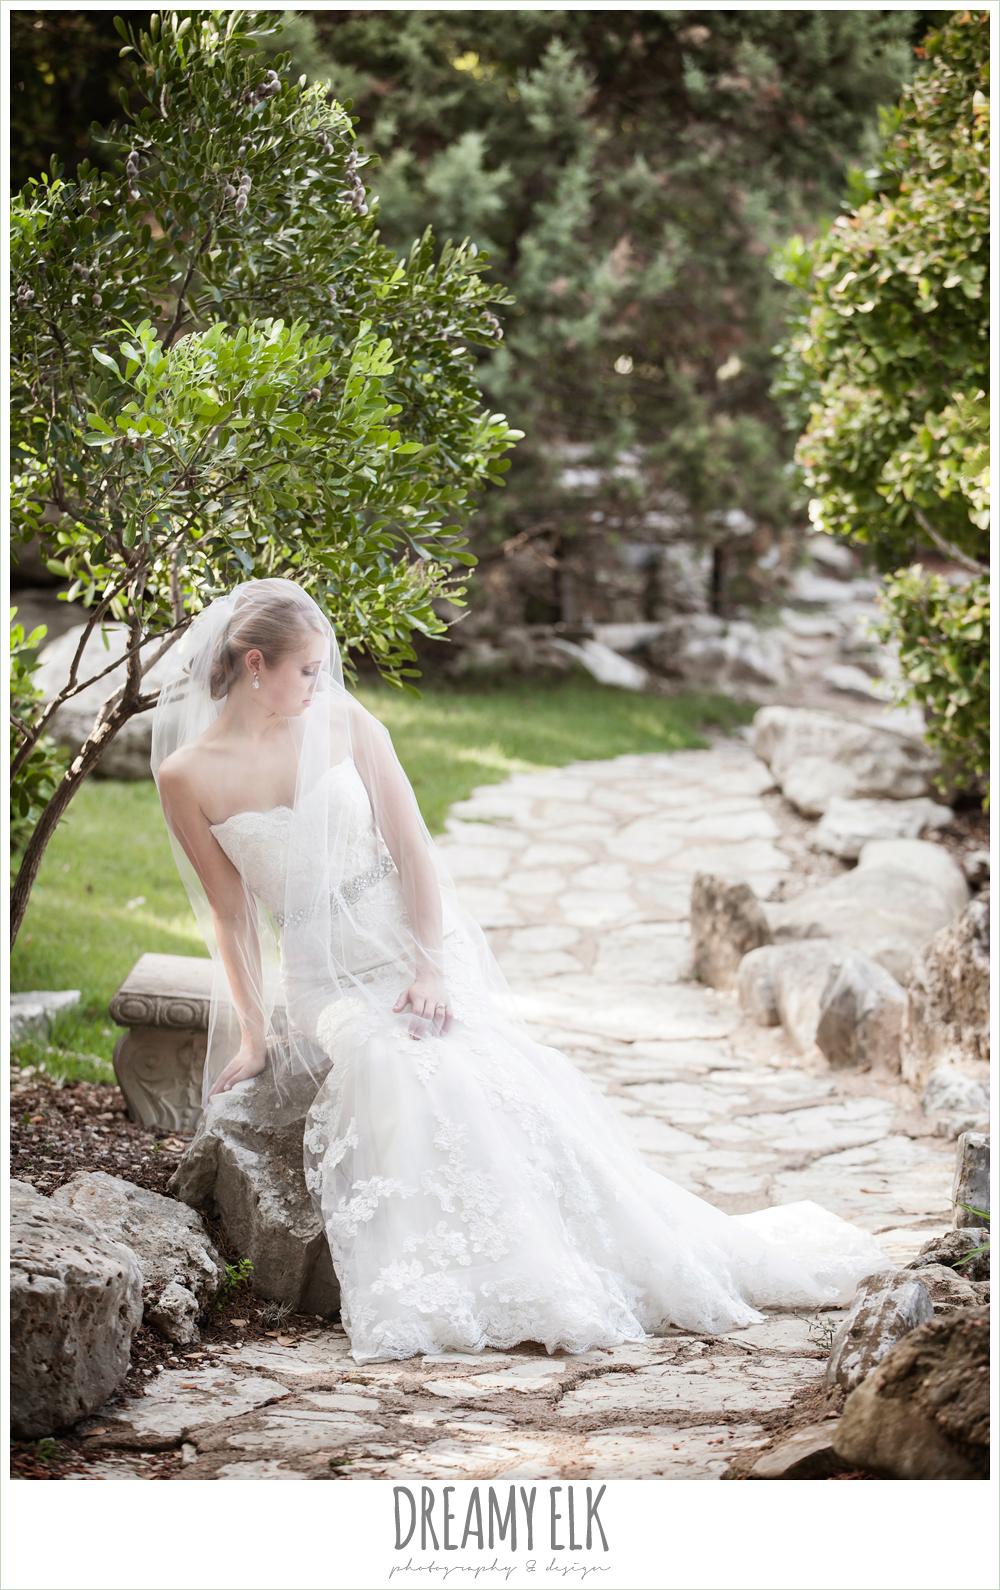 mermaid lace strapless wedding dress, summer outdoor bridal photos, zilker botanical gardens, austin, texas {dreamy elk photography and design}